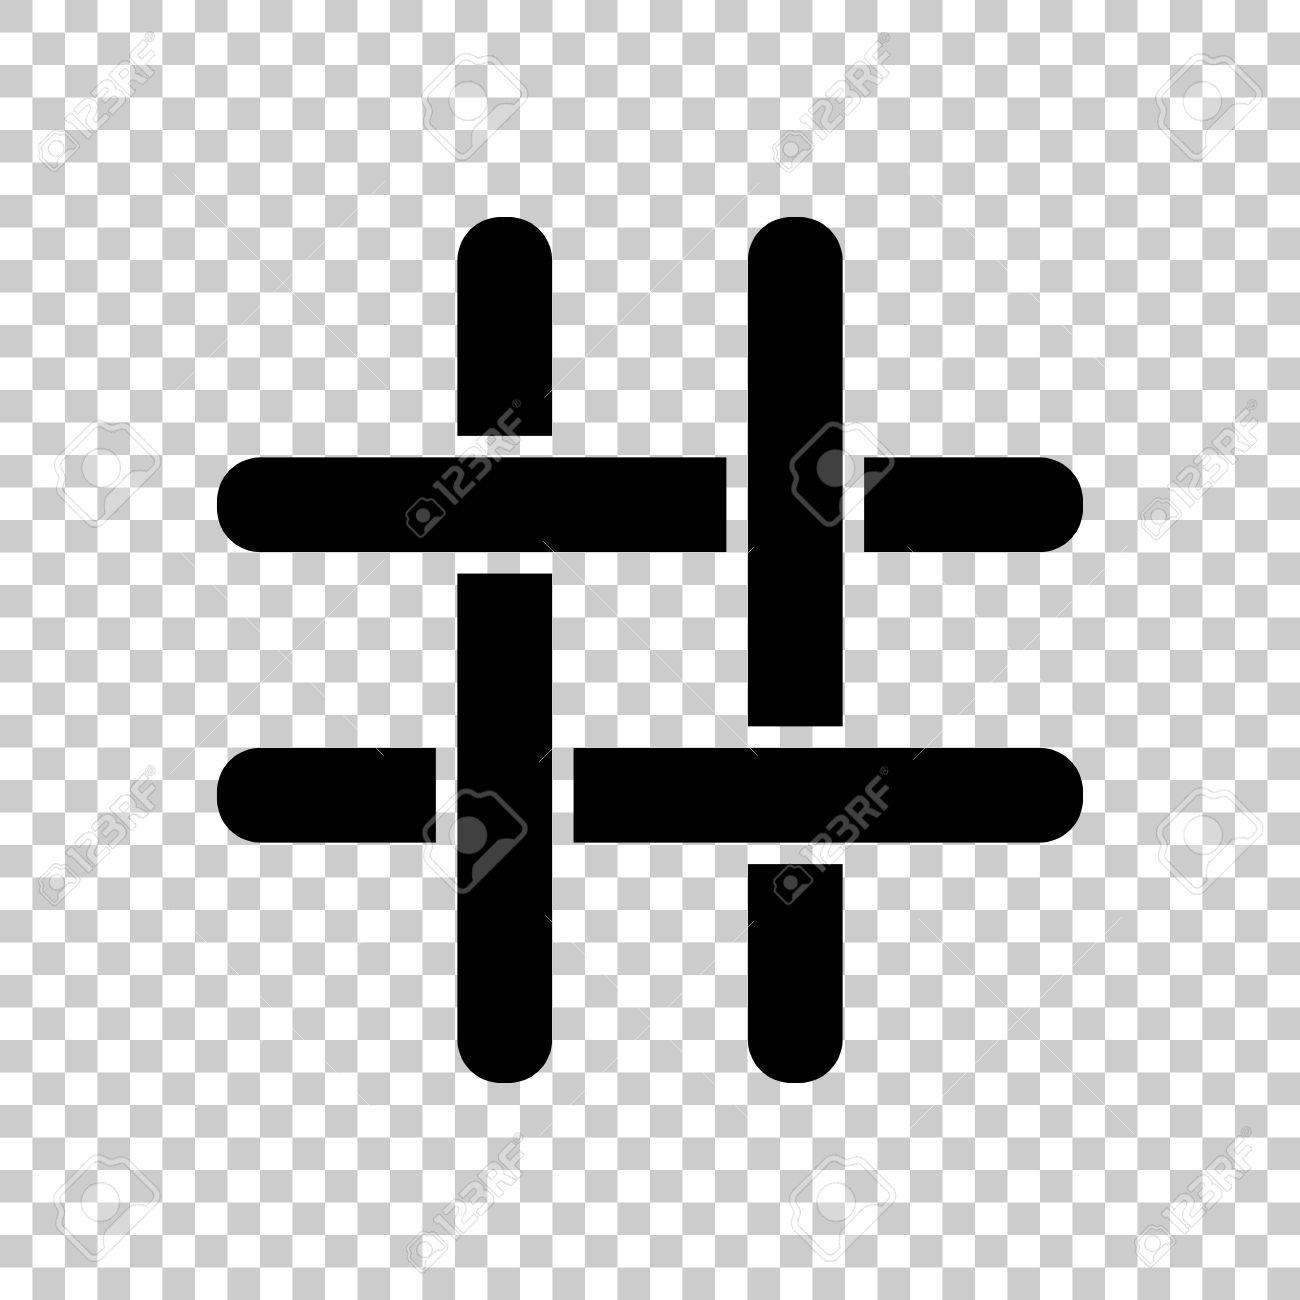 hashtag icon black icon on transparent background royalty free